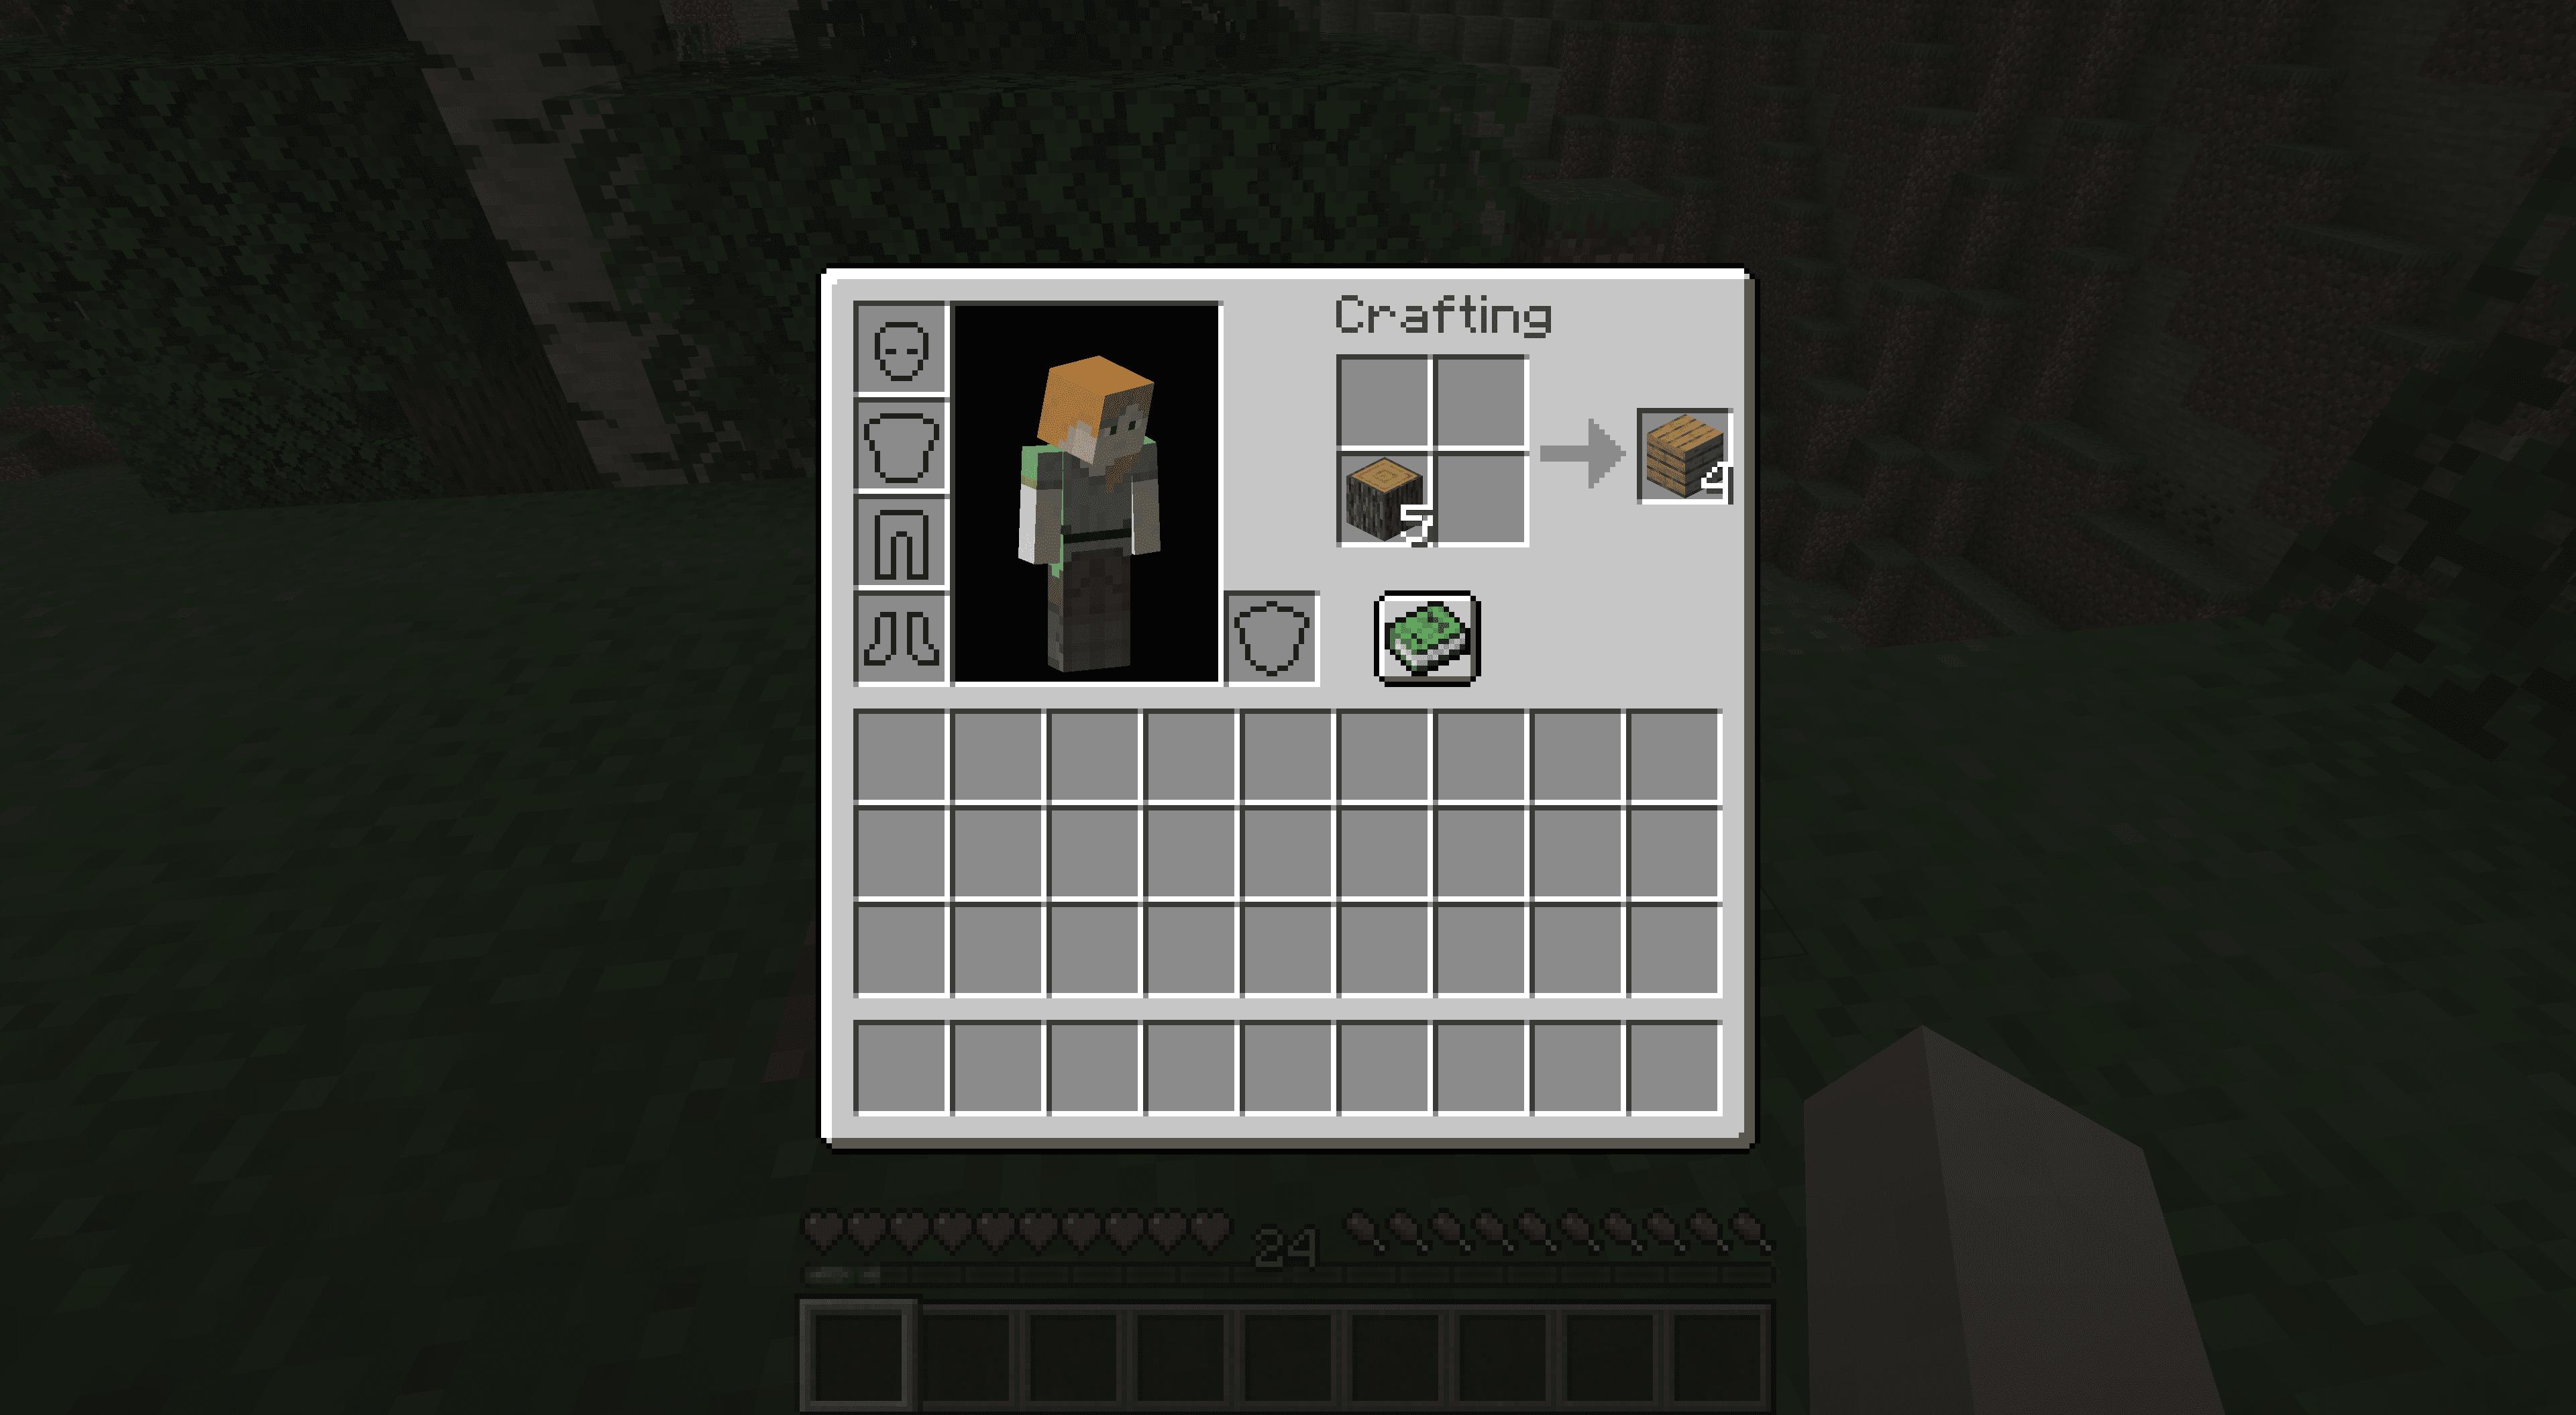 Making planks in Minecraft.